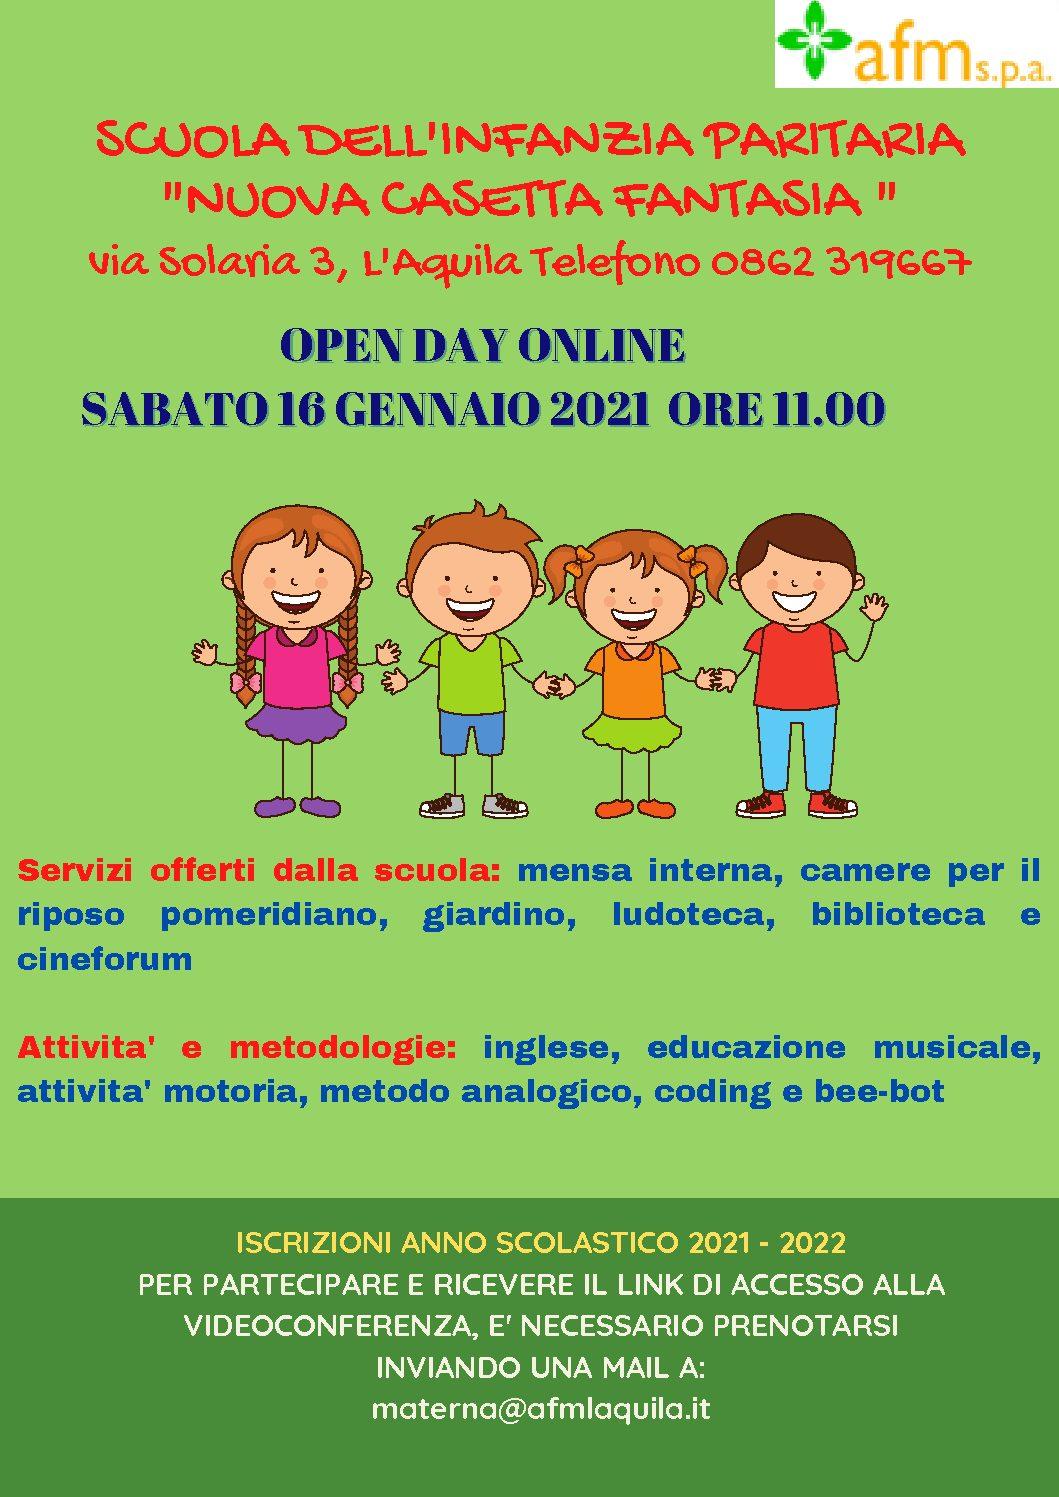 Open day Casetta Fantasia 16 gennaio 2021